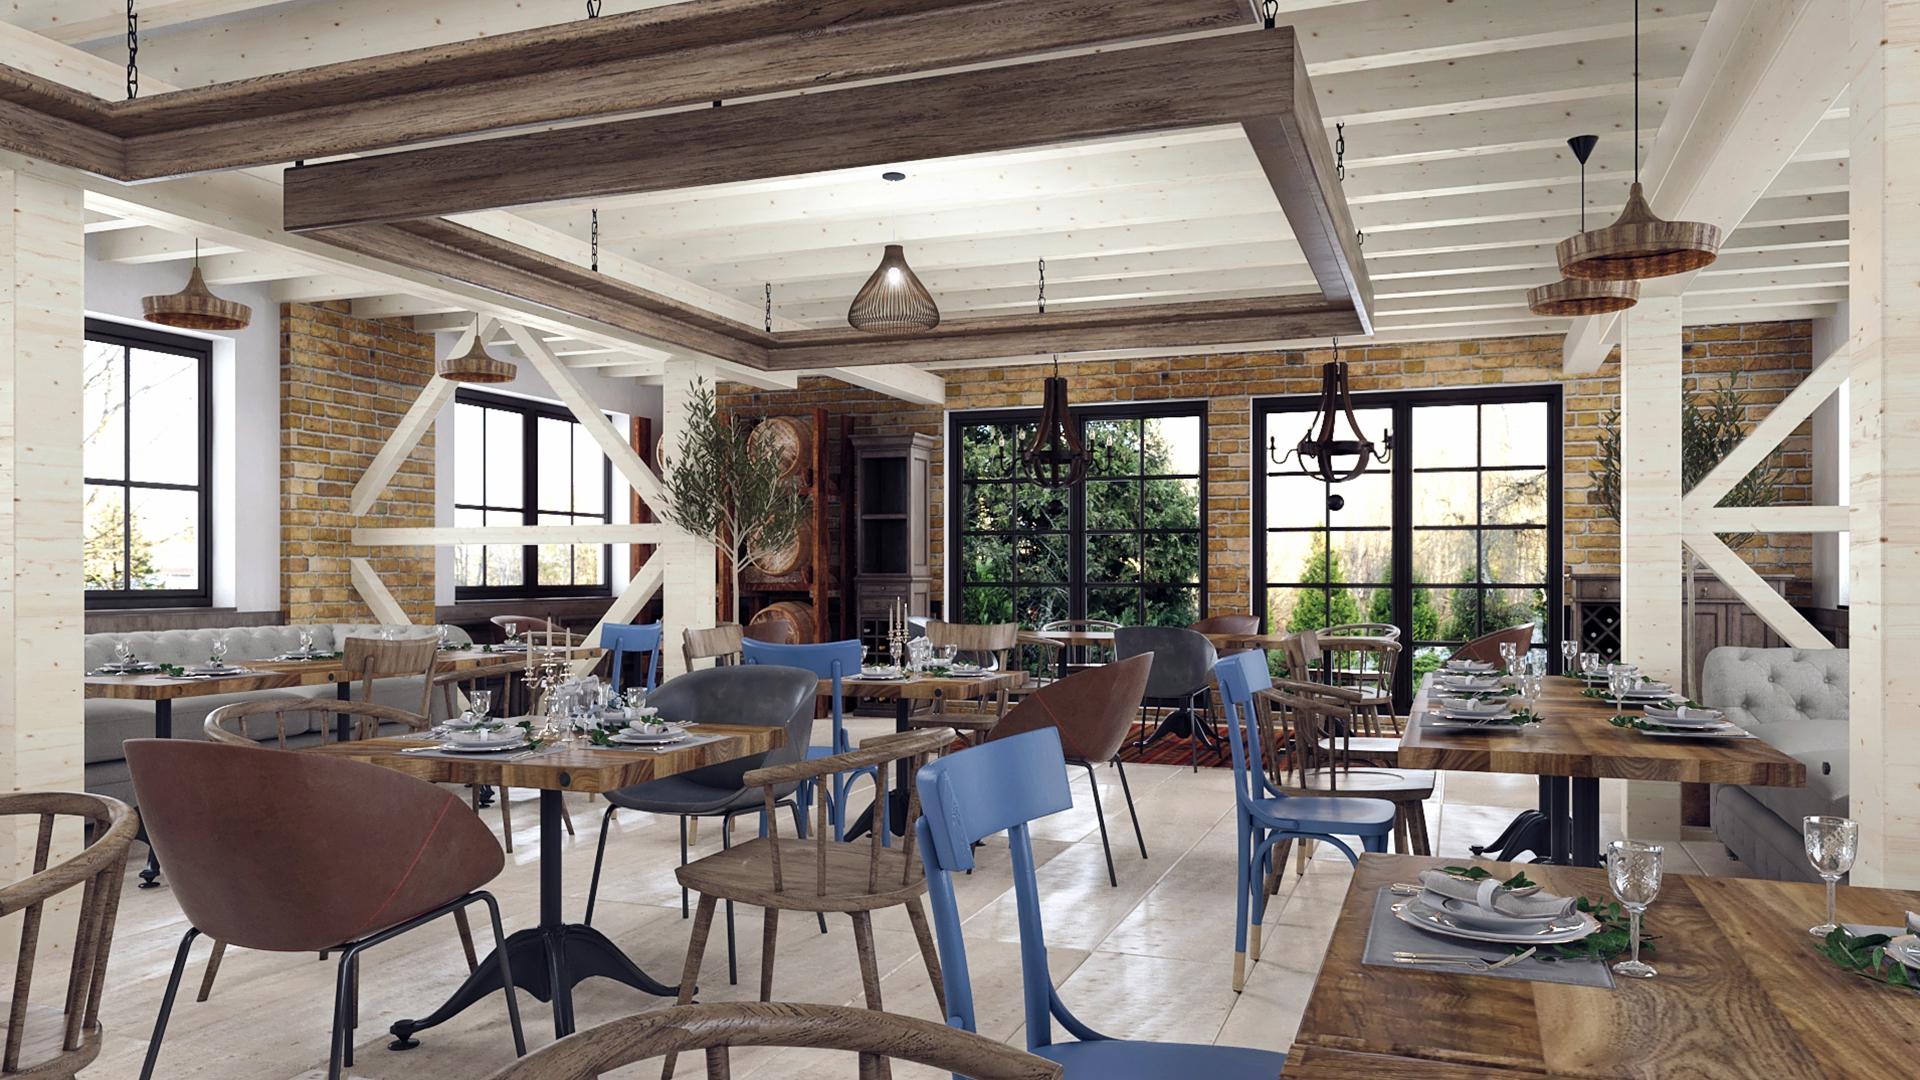 design interior restaurant country domeniile panciu